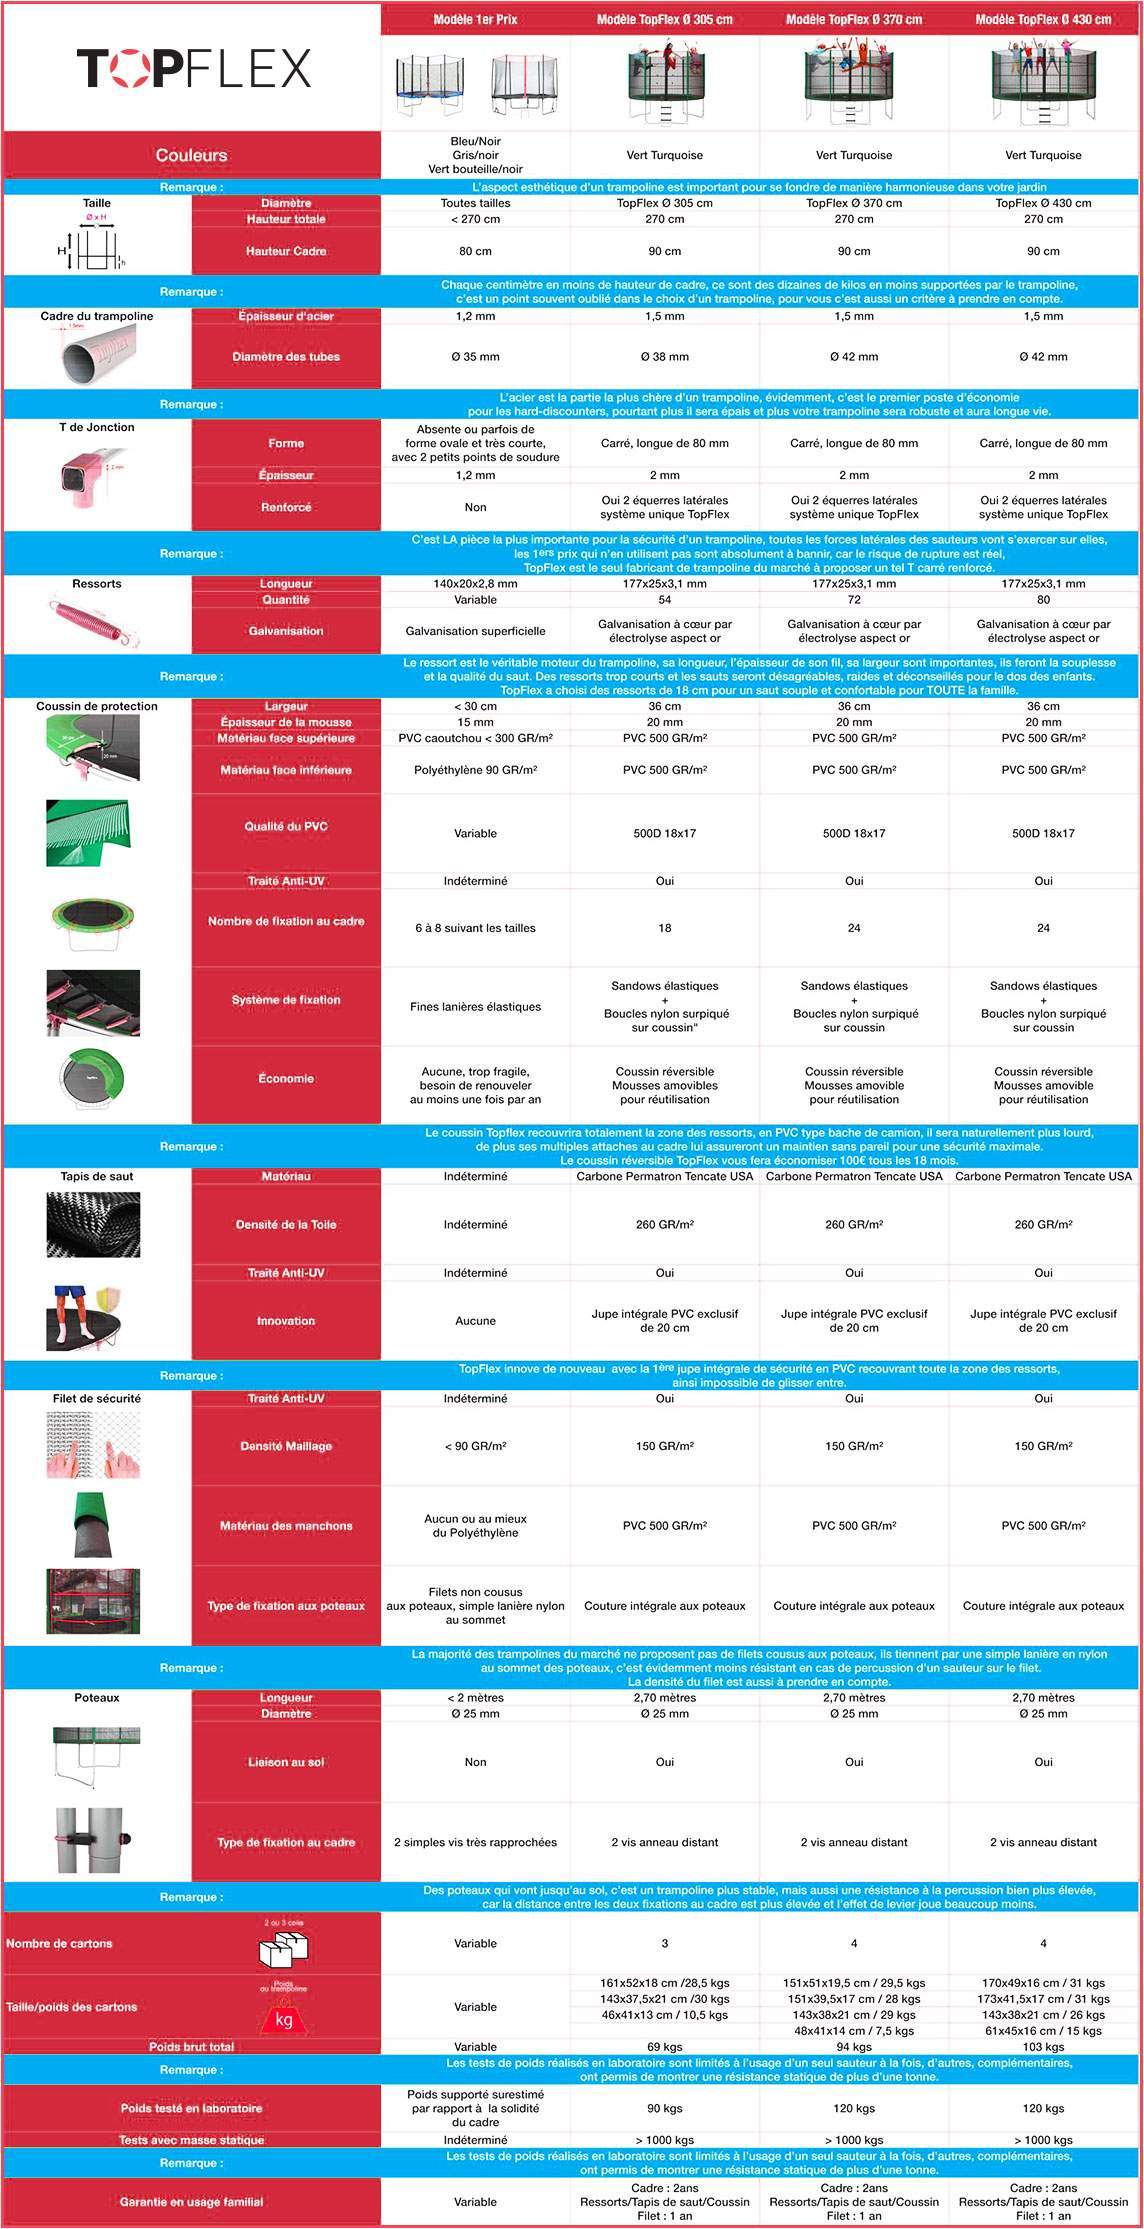 tableau comparatif trampoline decathlon et topflex